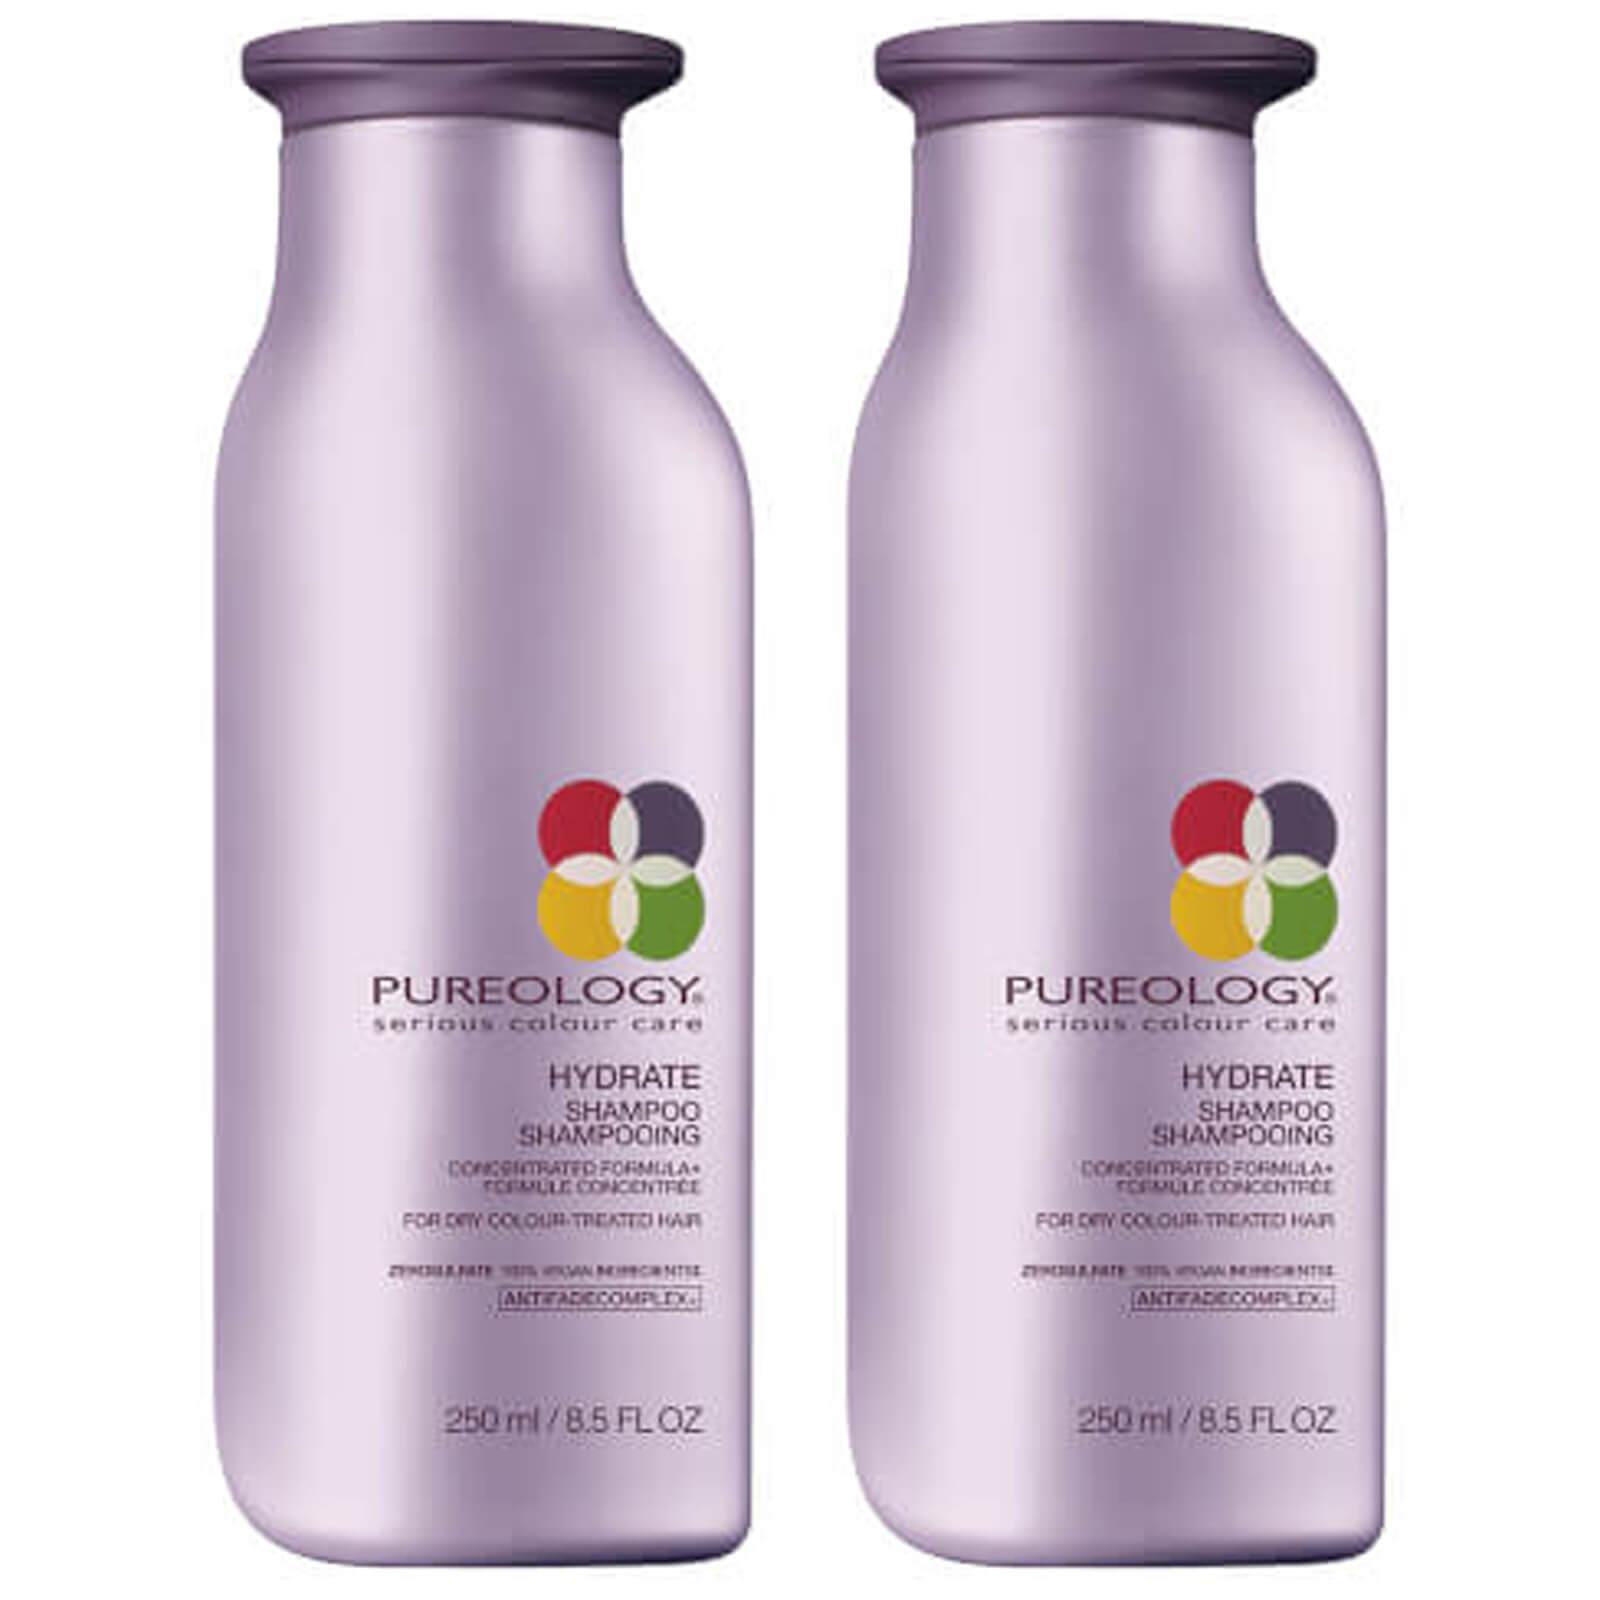 Duo de Shampooings Hydrate Pureology 250ml